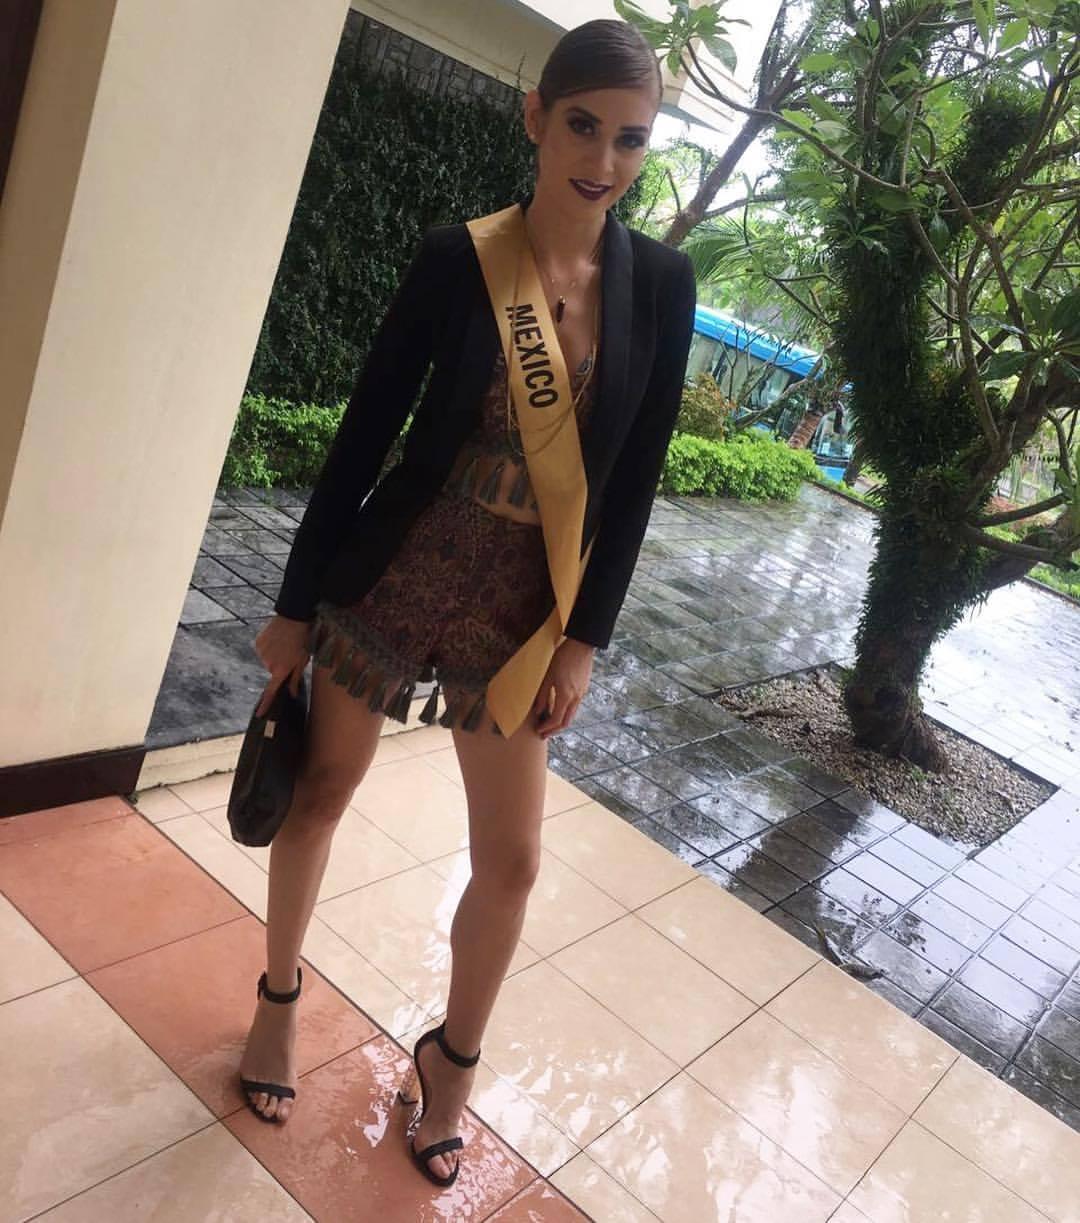 yoana gutierrez, top 20 de miss grand international 2017. - Página 5 22339099-1666022973449056-1675825869239606336-o